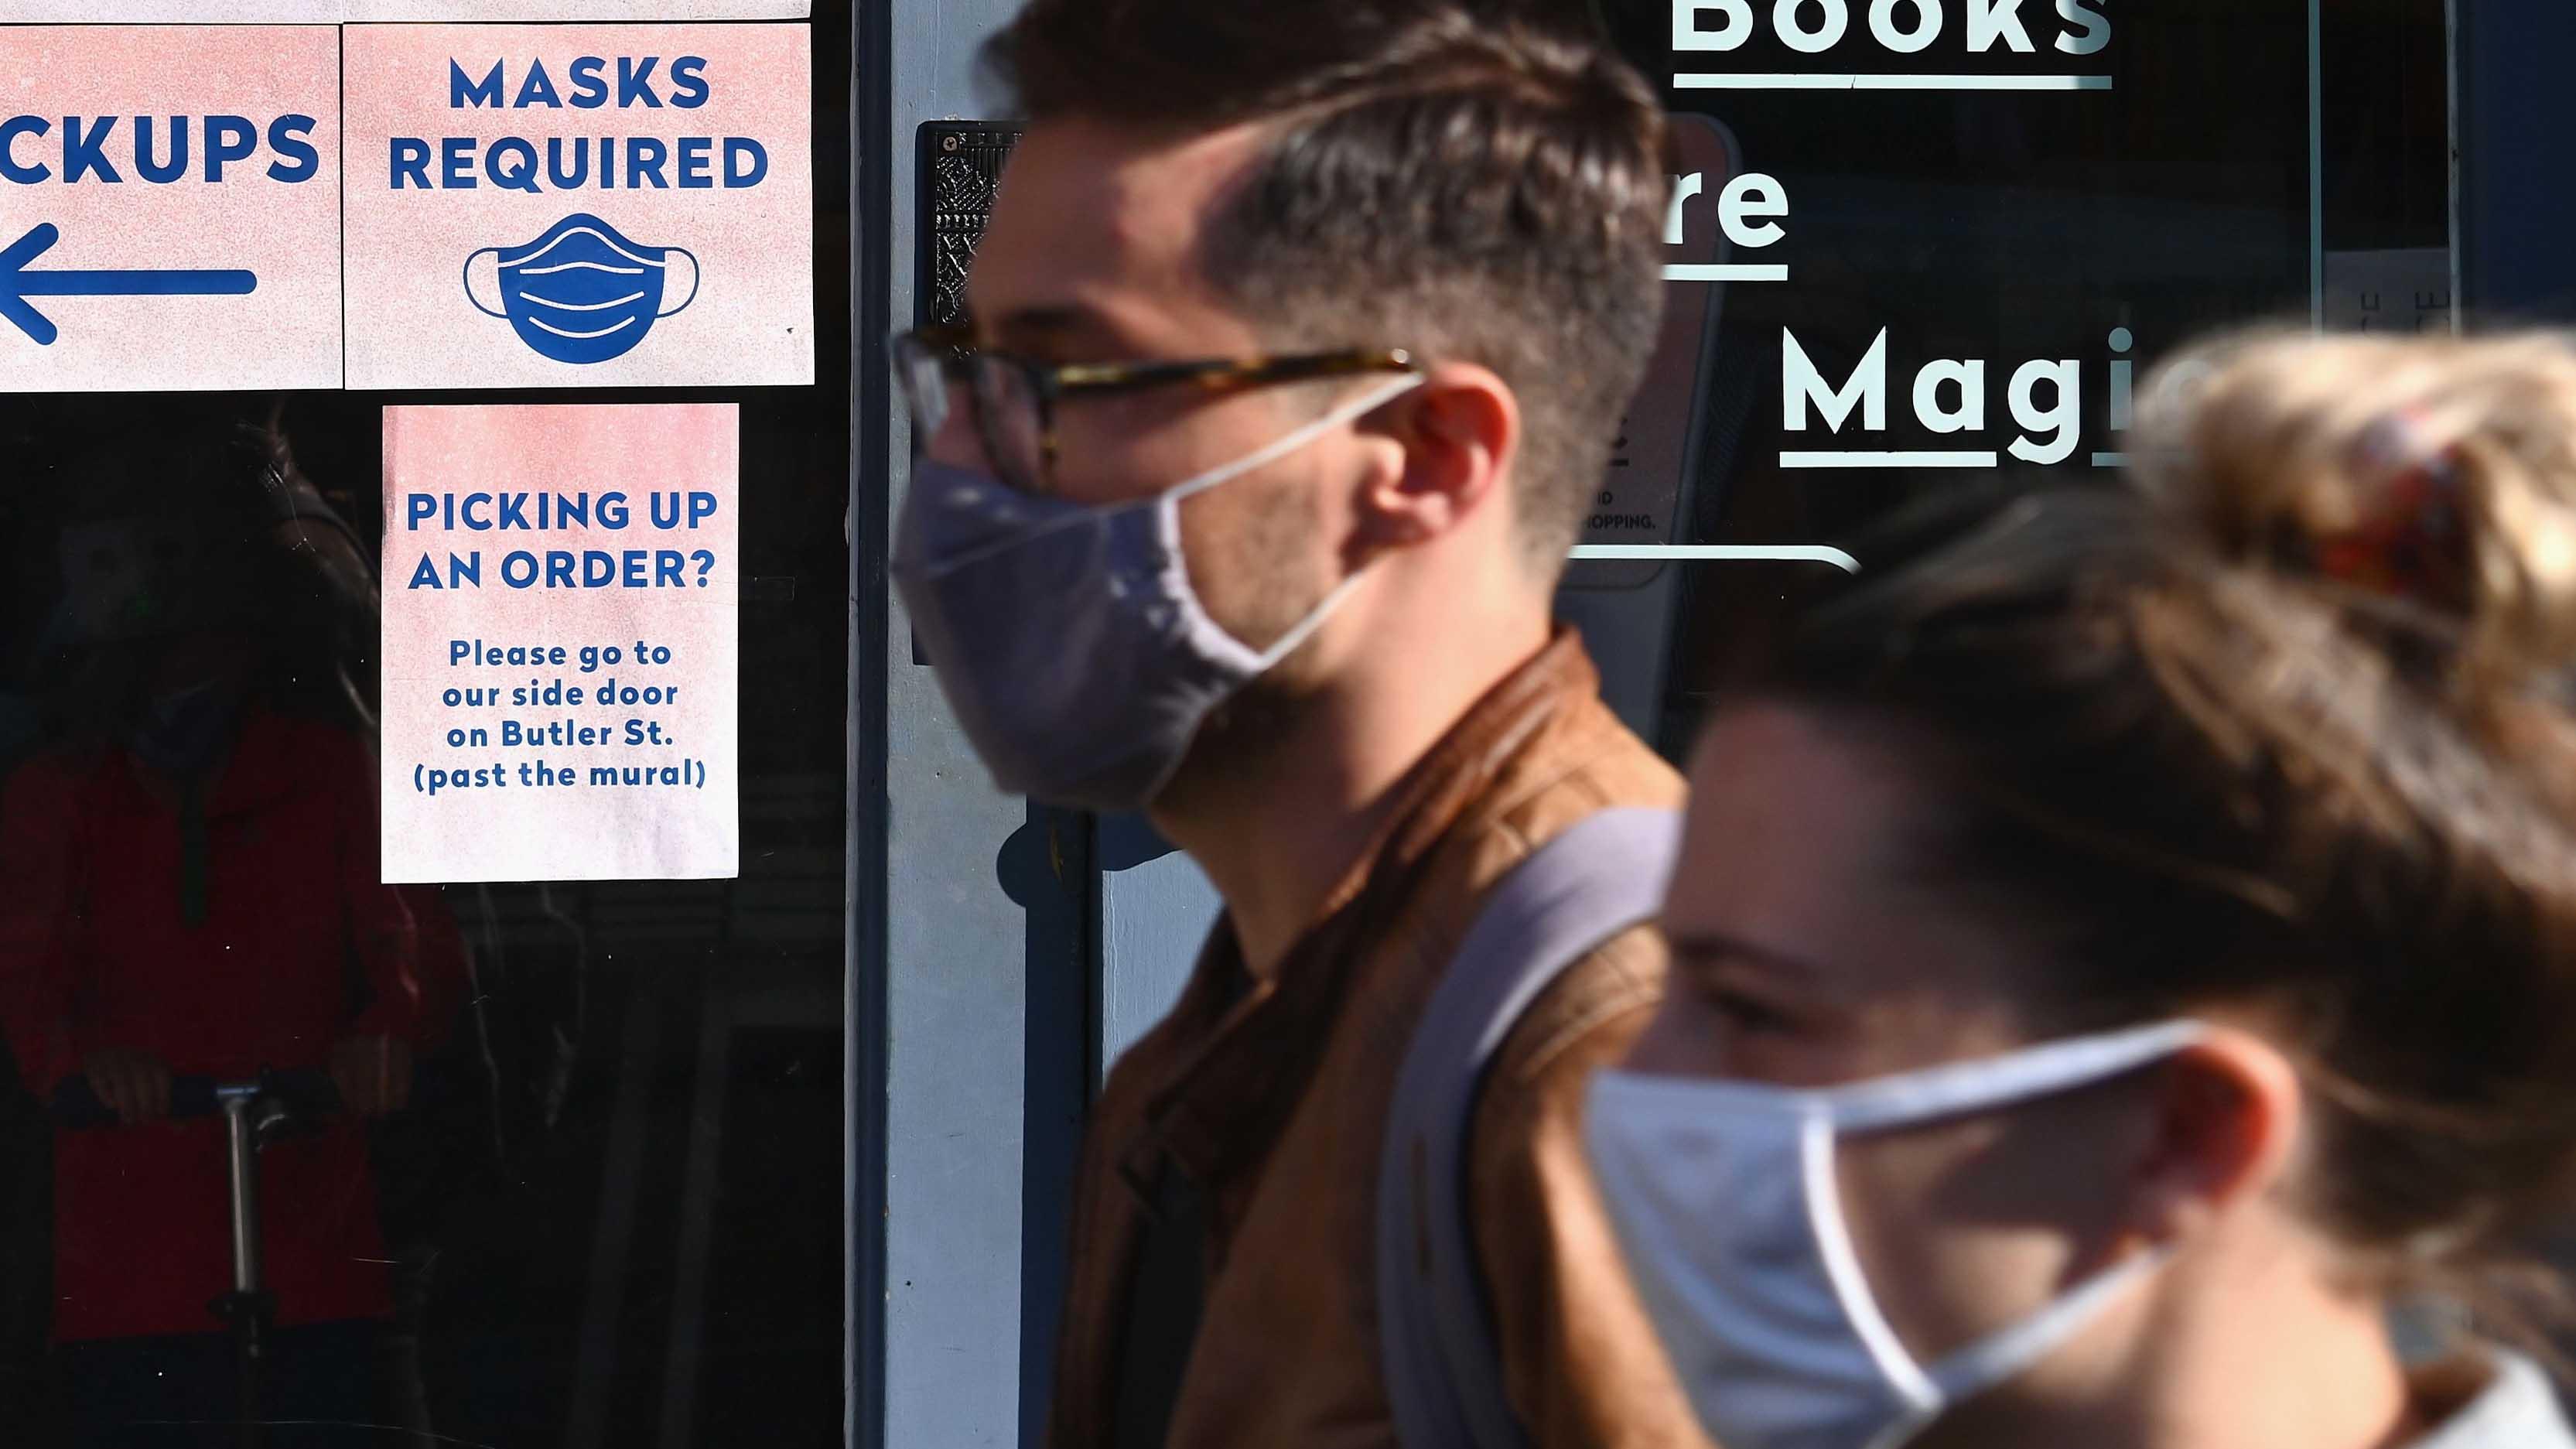 Health Experts Warn Against COVID-19 Fatigue